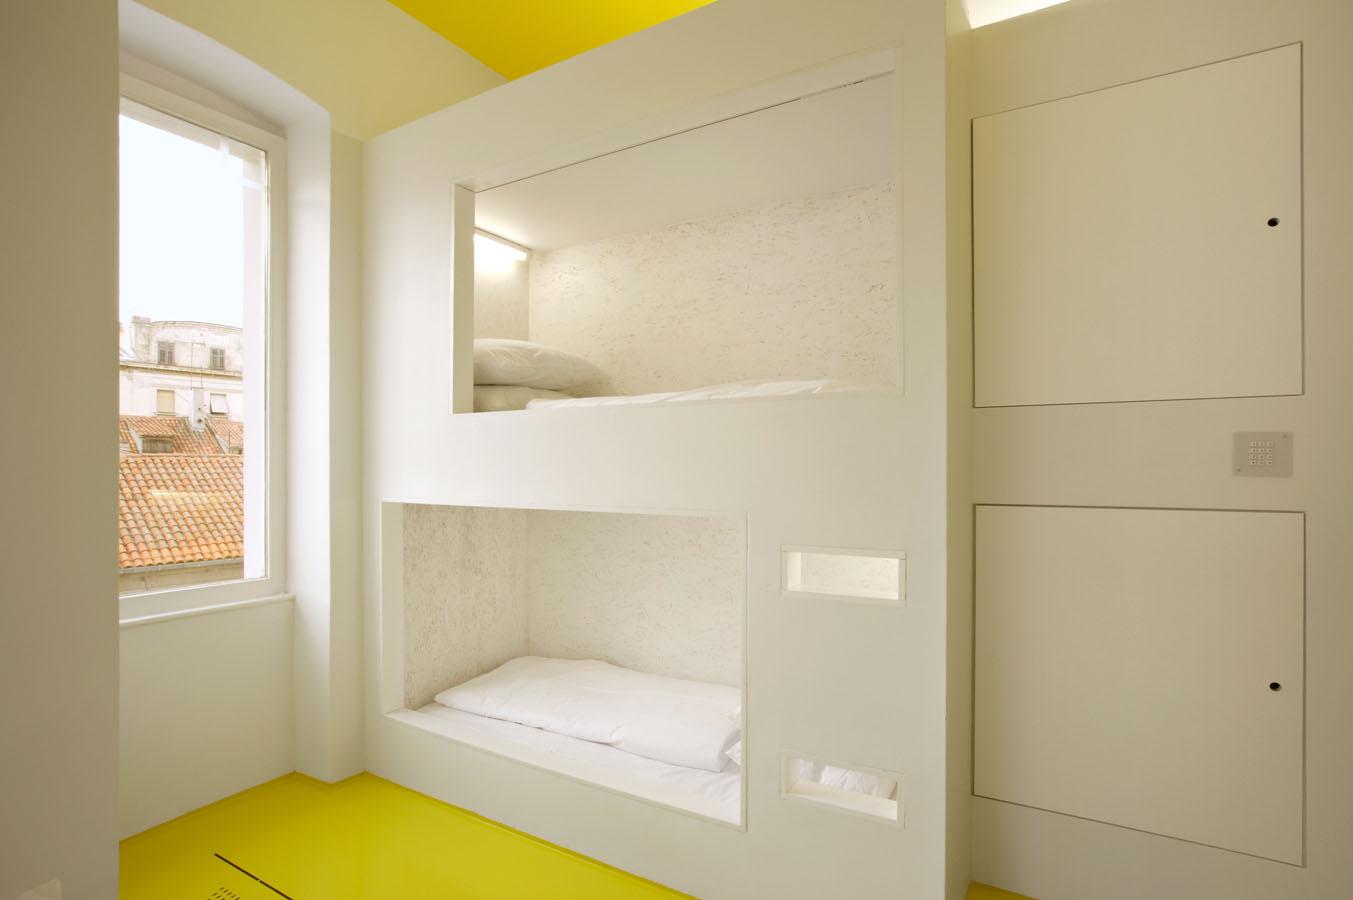 hostel golly bossy by studio up 13 Hostel Golly±Bossy By Studio Up